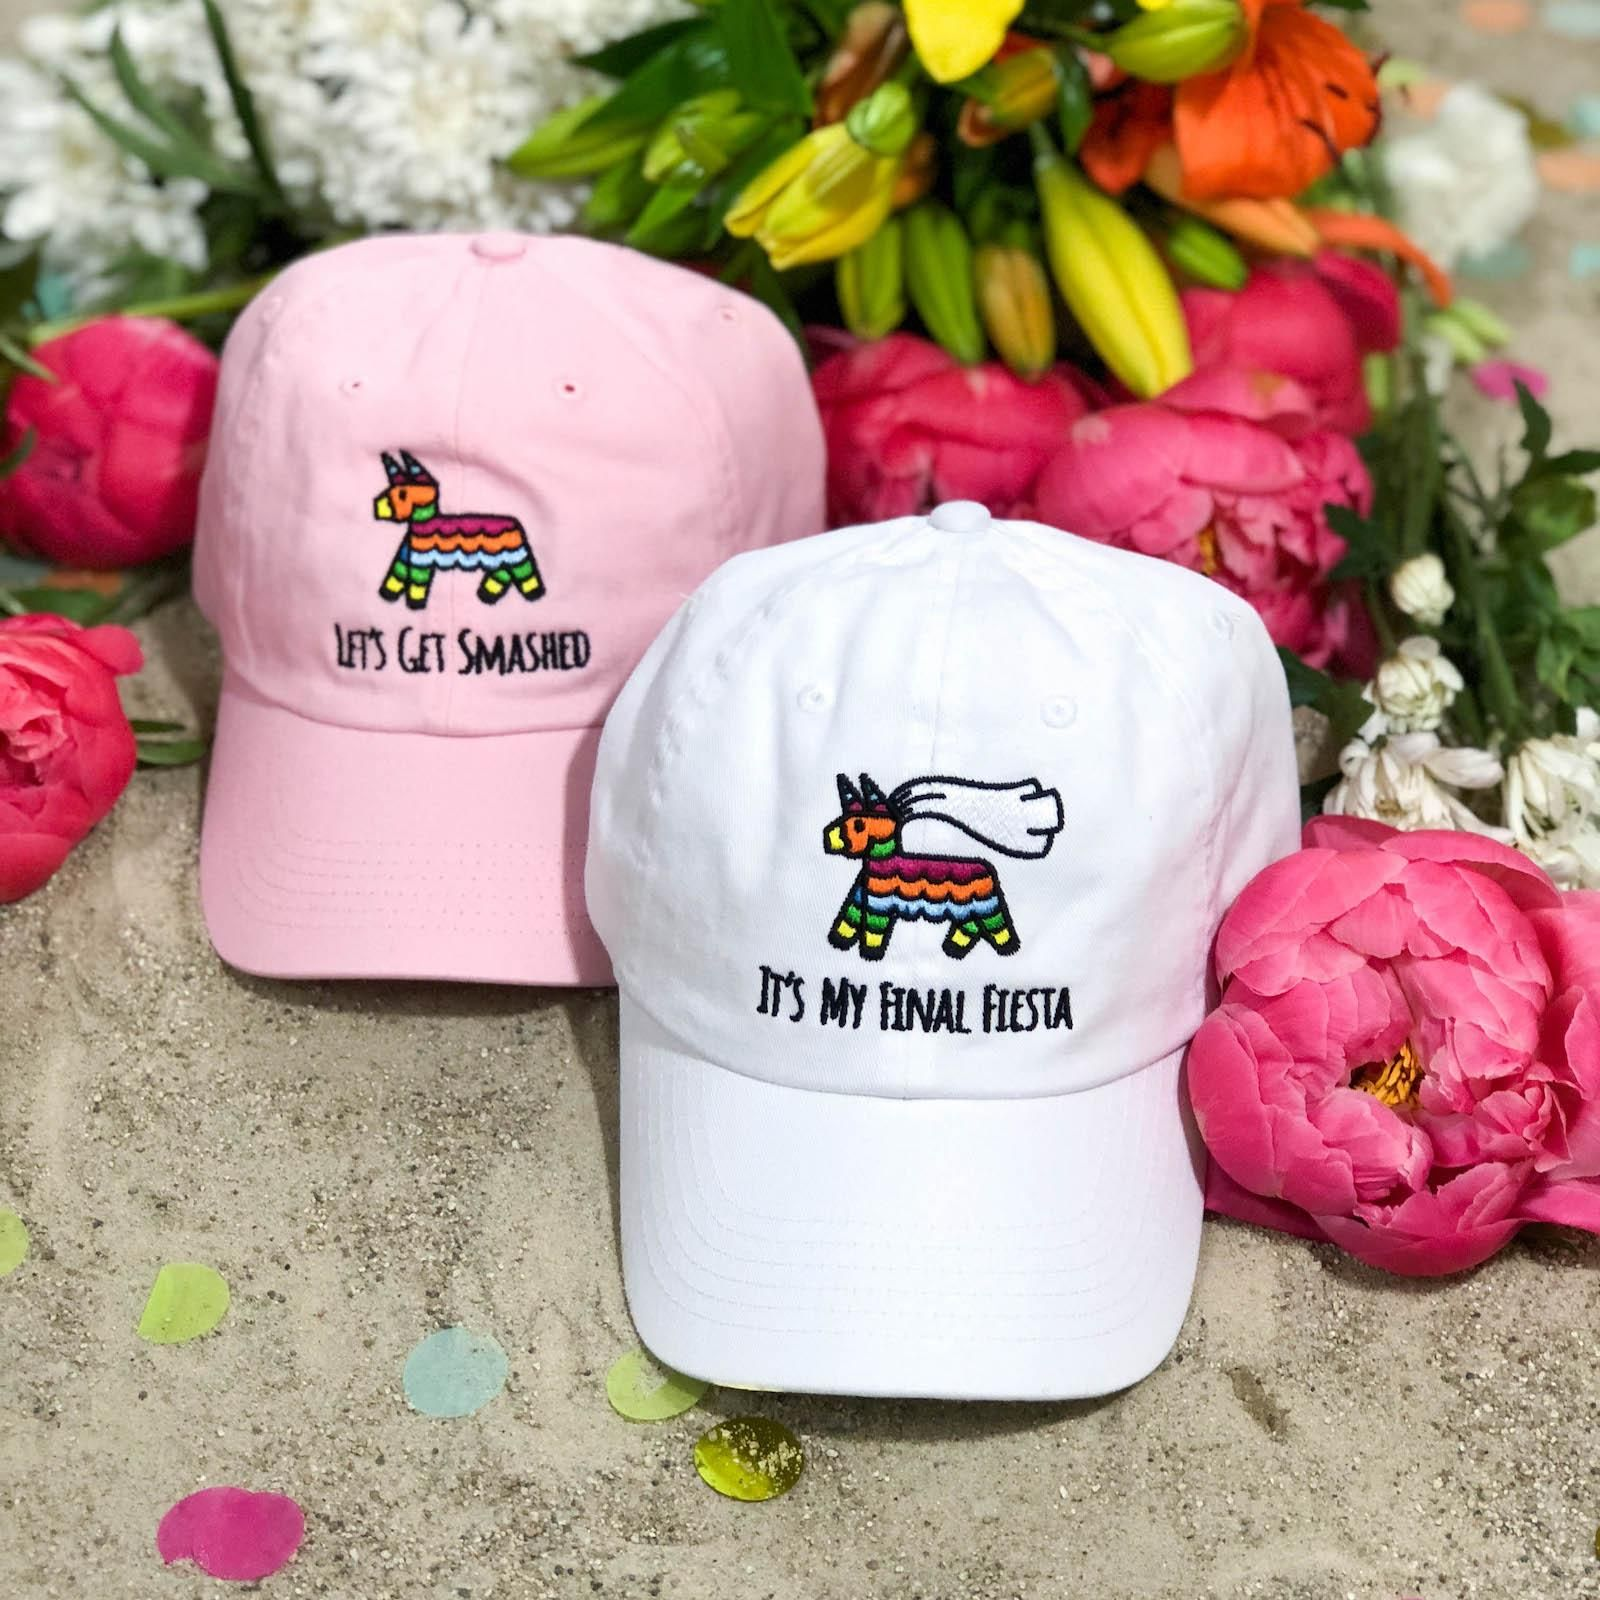 Nacho Average Bride Hat Bridesmaids Caps Mexico Bachelorette Hats Down to Fiesta Hats Mexico Bridesmaids Hats Funny Snapback Hats